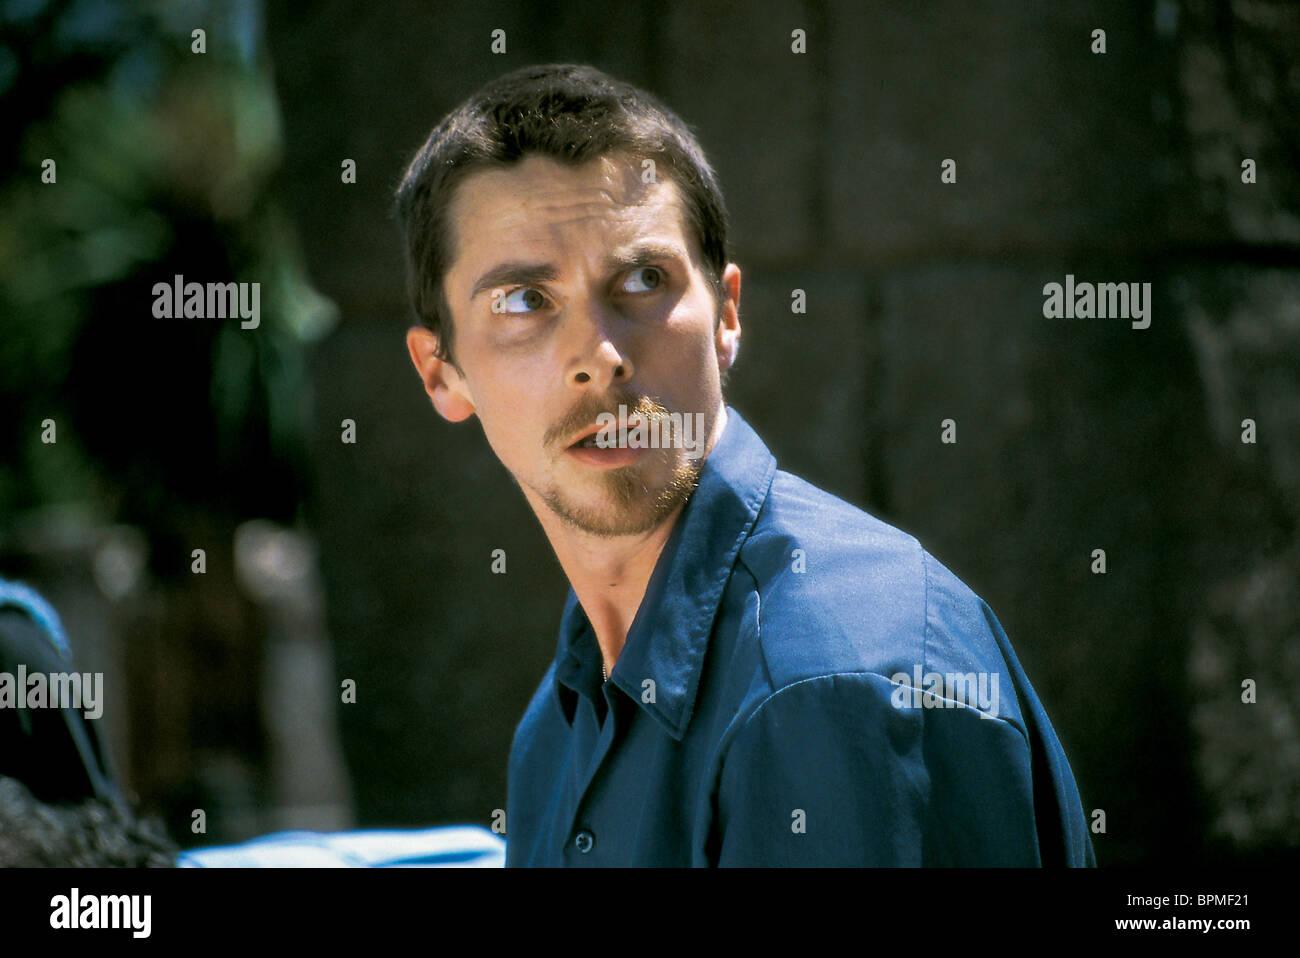 Christian Bale Der Maschinist 2004 Stockfoto Bild 31183657 Alamy